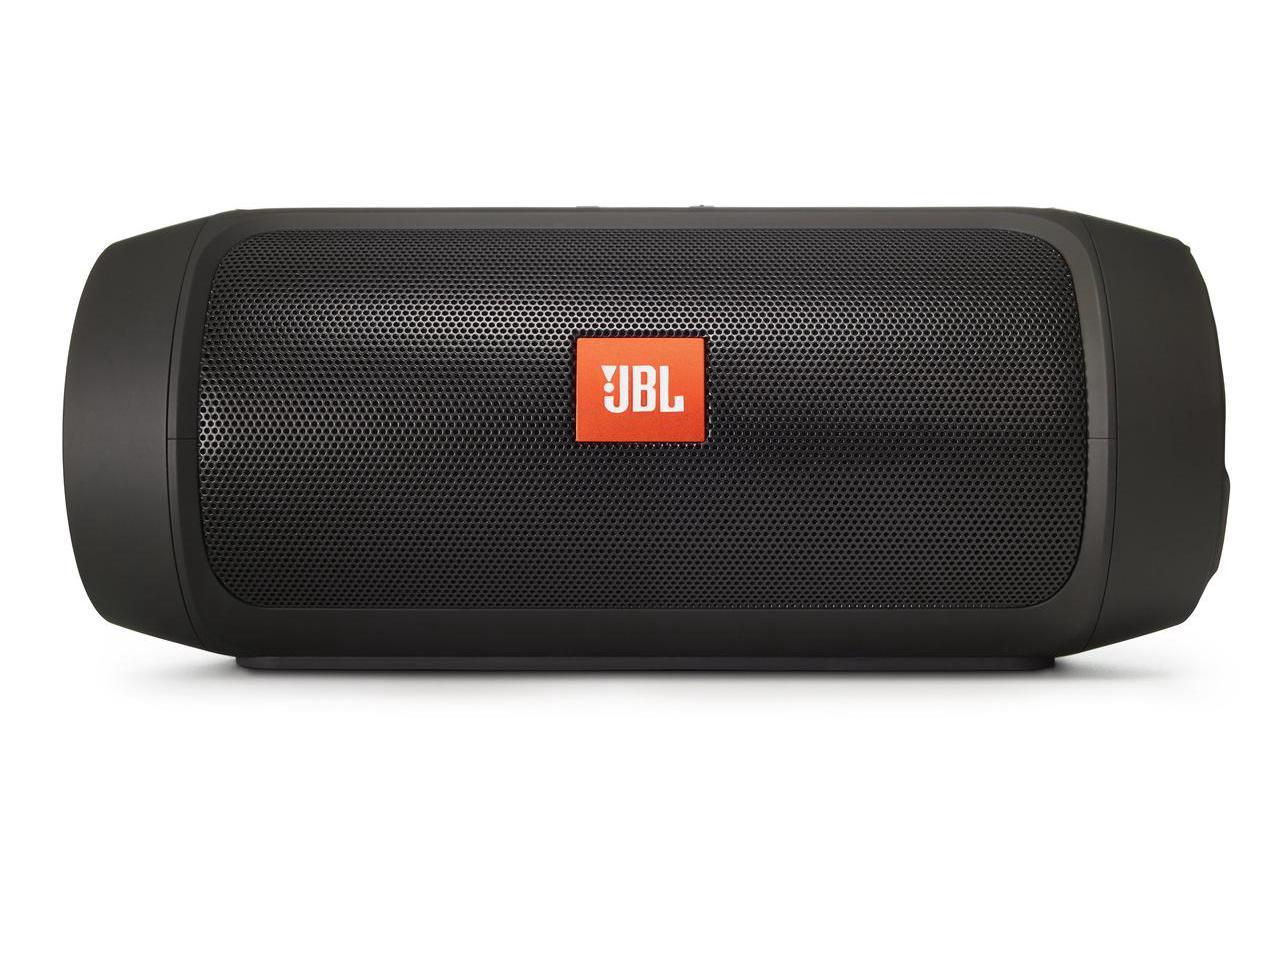 JBL Charge 2+ Portable Bluetooth Splashproof Speaker (Black) + $10 Newegg Gift Card $69.99 + Free Shipping